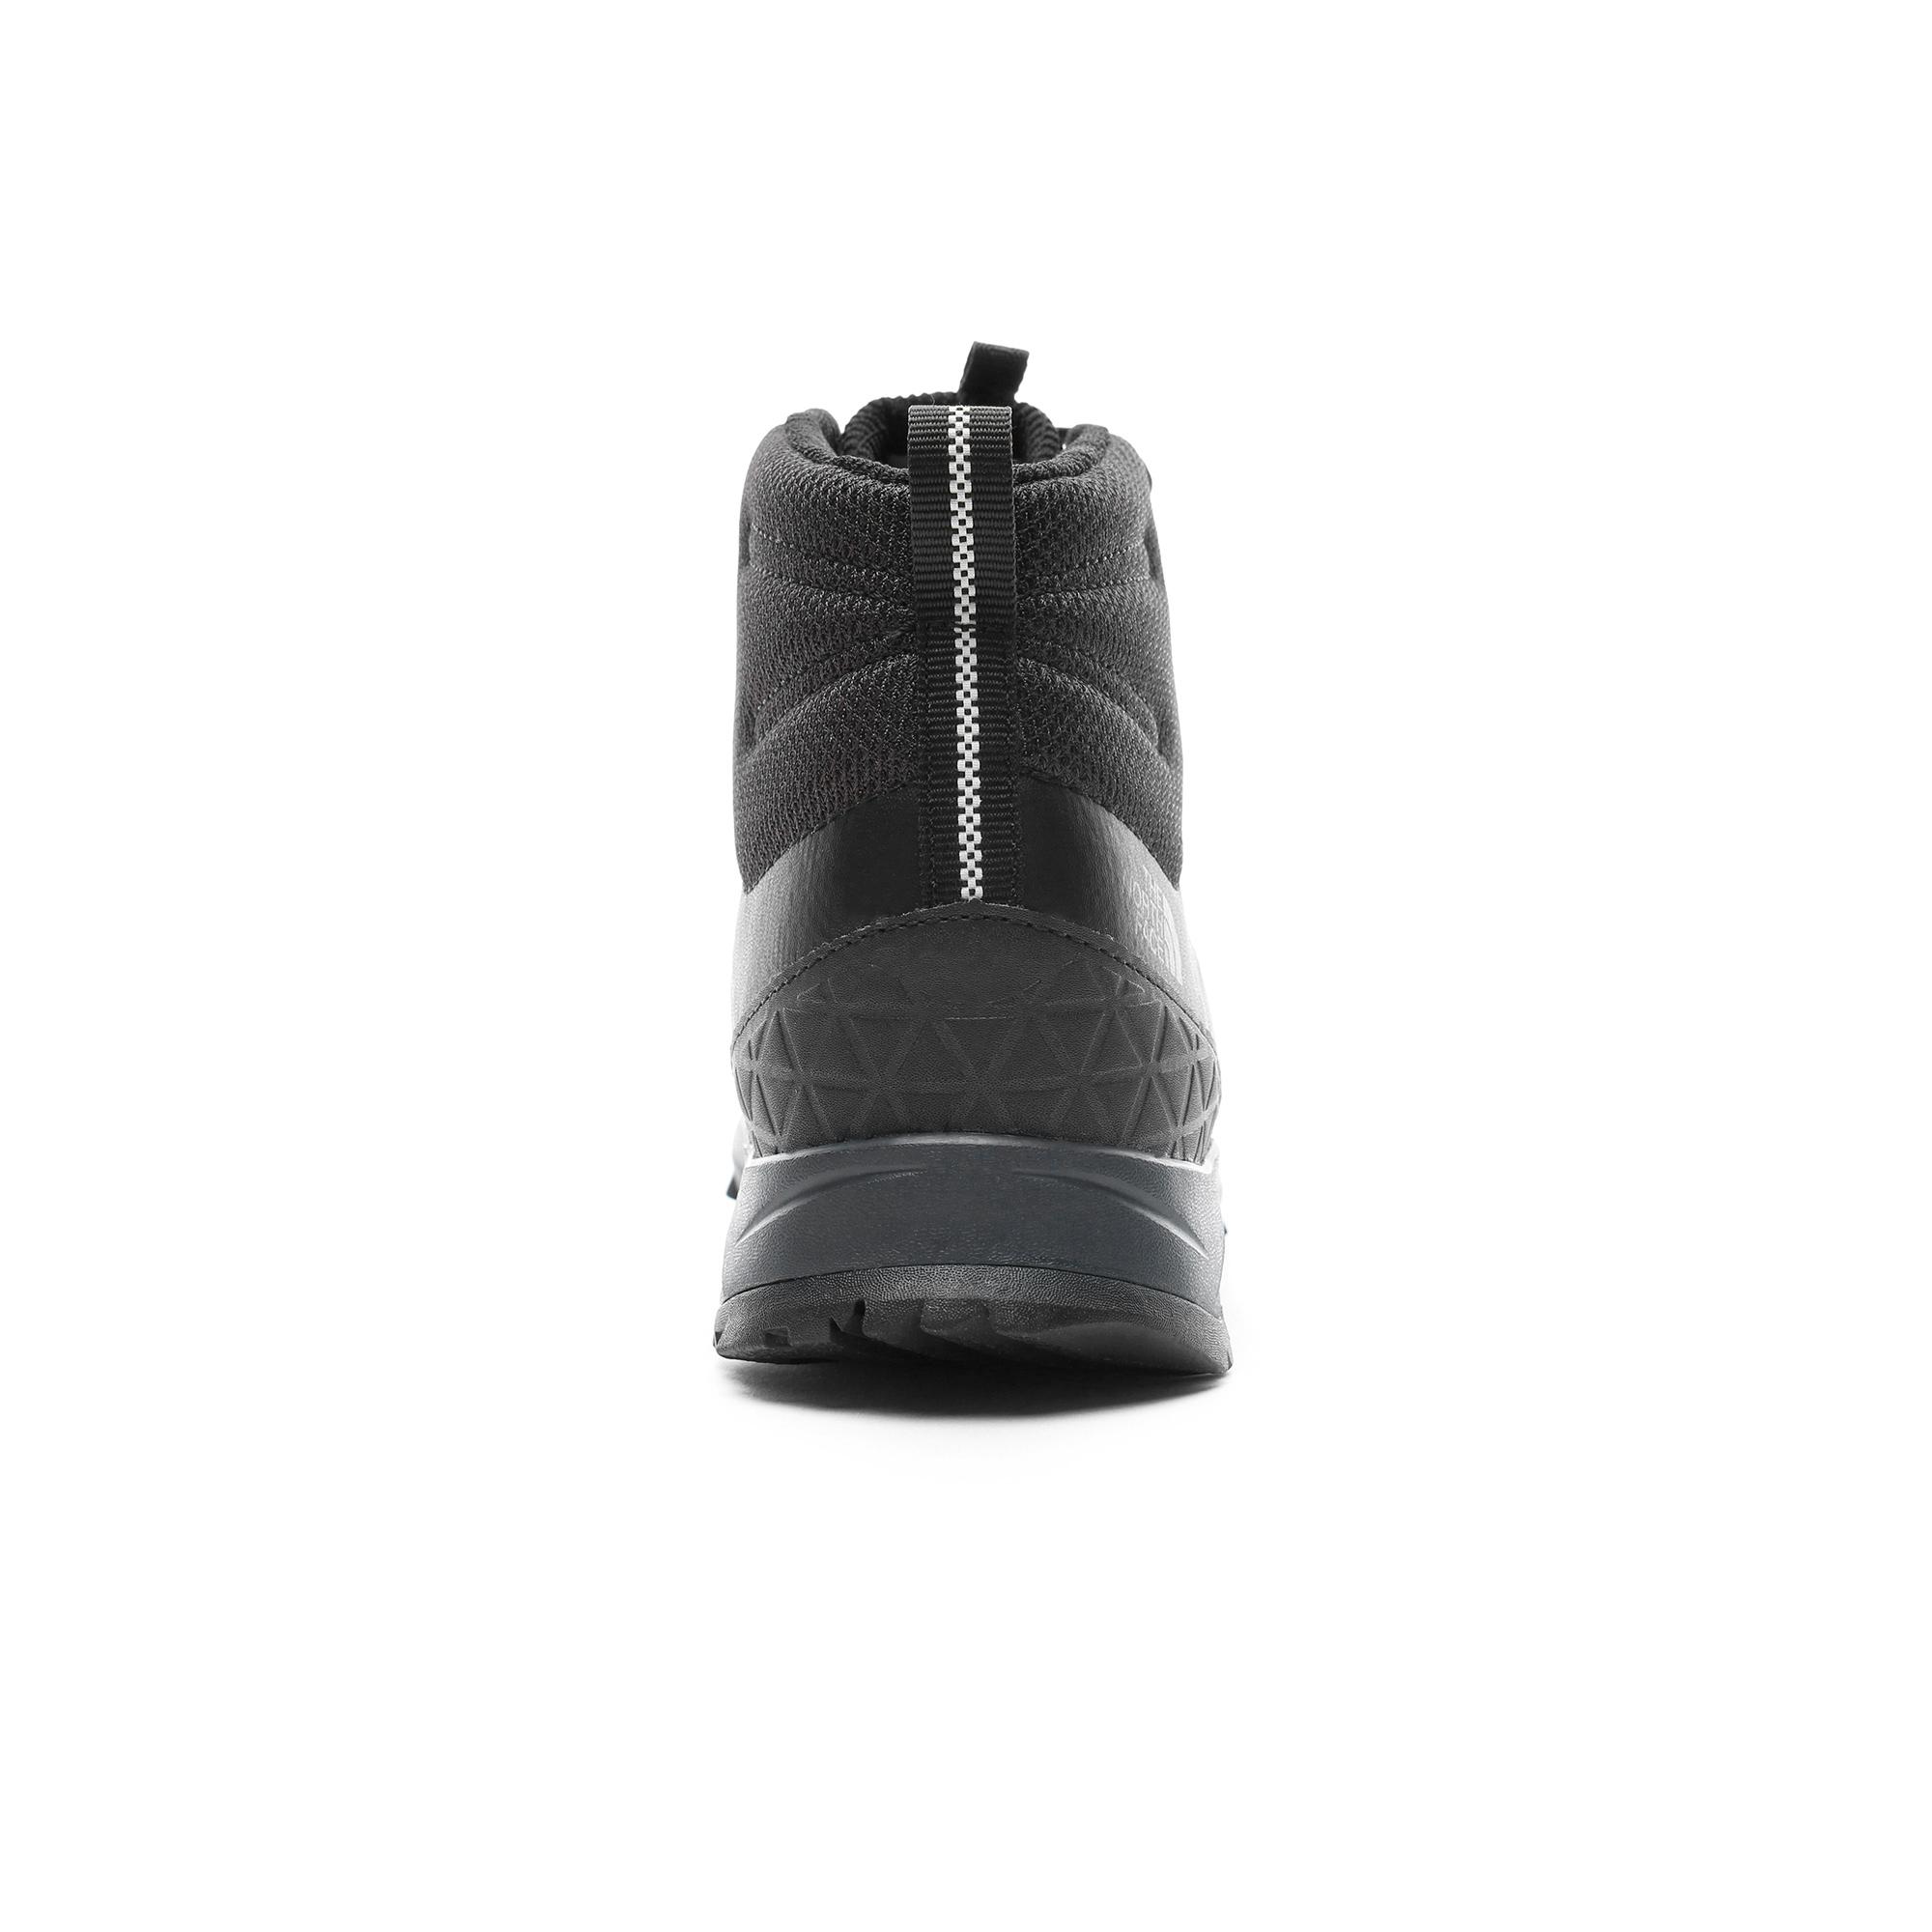 The North Face Erkek Litewave Fastpack II Mid Gore-Tex® Siyah Doğa Yürüyüşü Botu